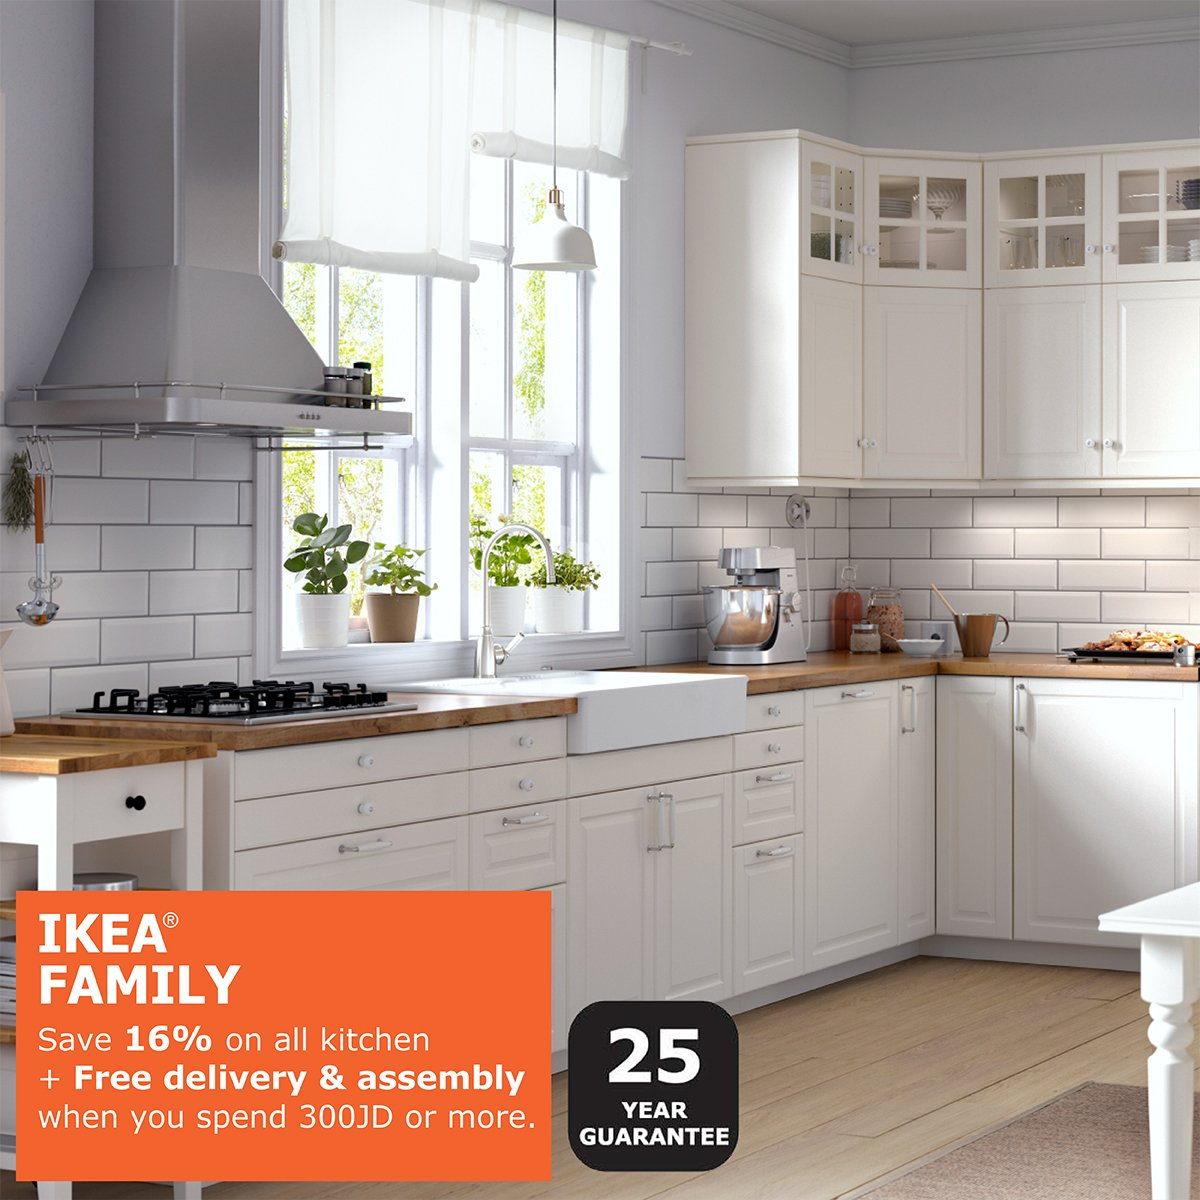 Ikea Kitchen Jordan - Home and Aplliances